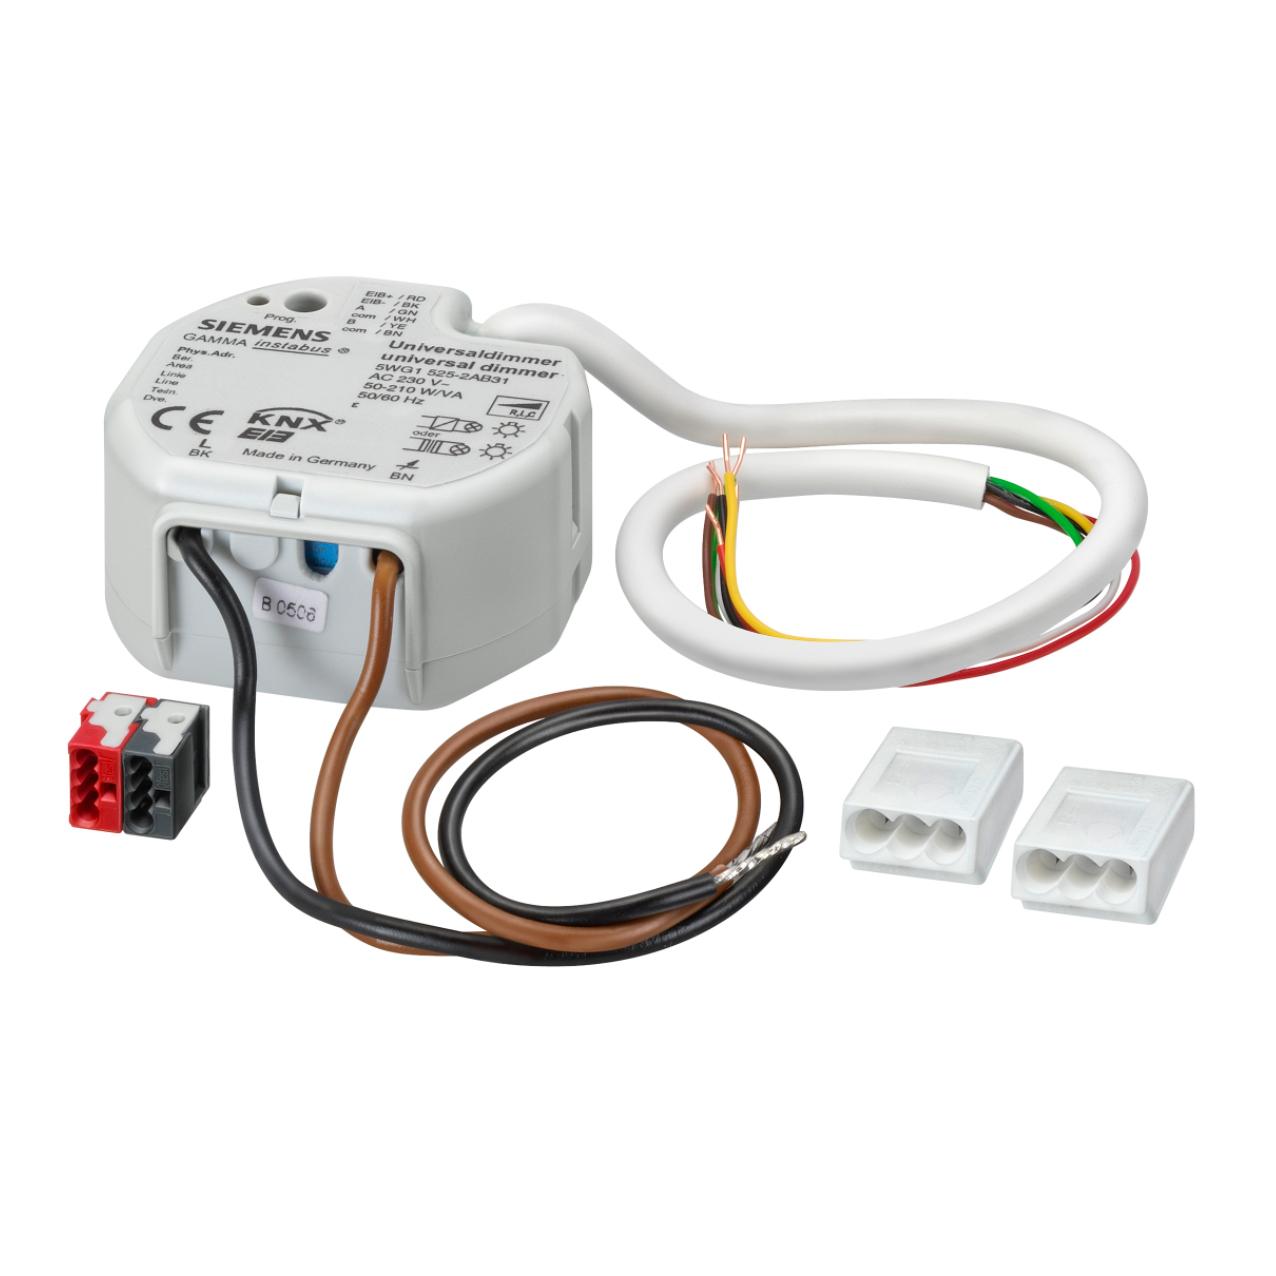 1 Stk Universaldimmer, 210 VA, AC 230 V, (R,L,C-Last) KX5252AB31